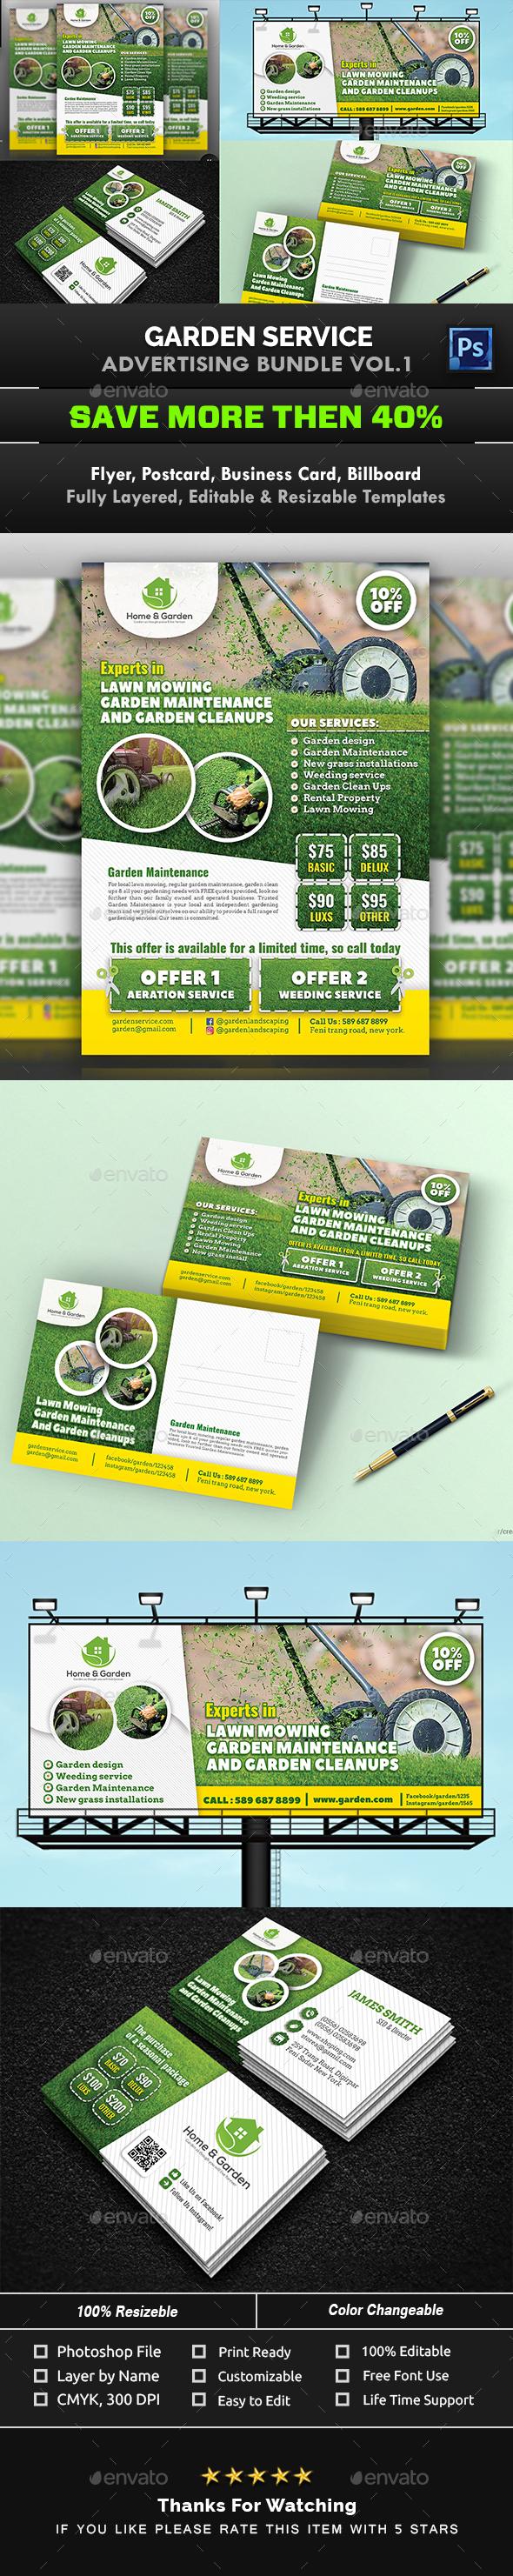 Garden Landscape Advertising Bundle Vol.1 - Signage Print Templates